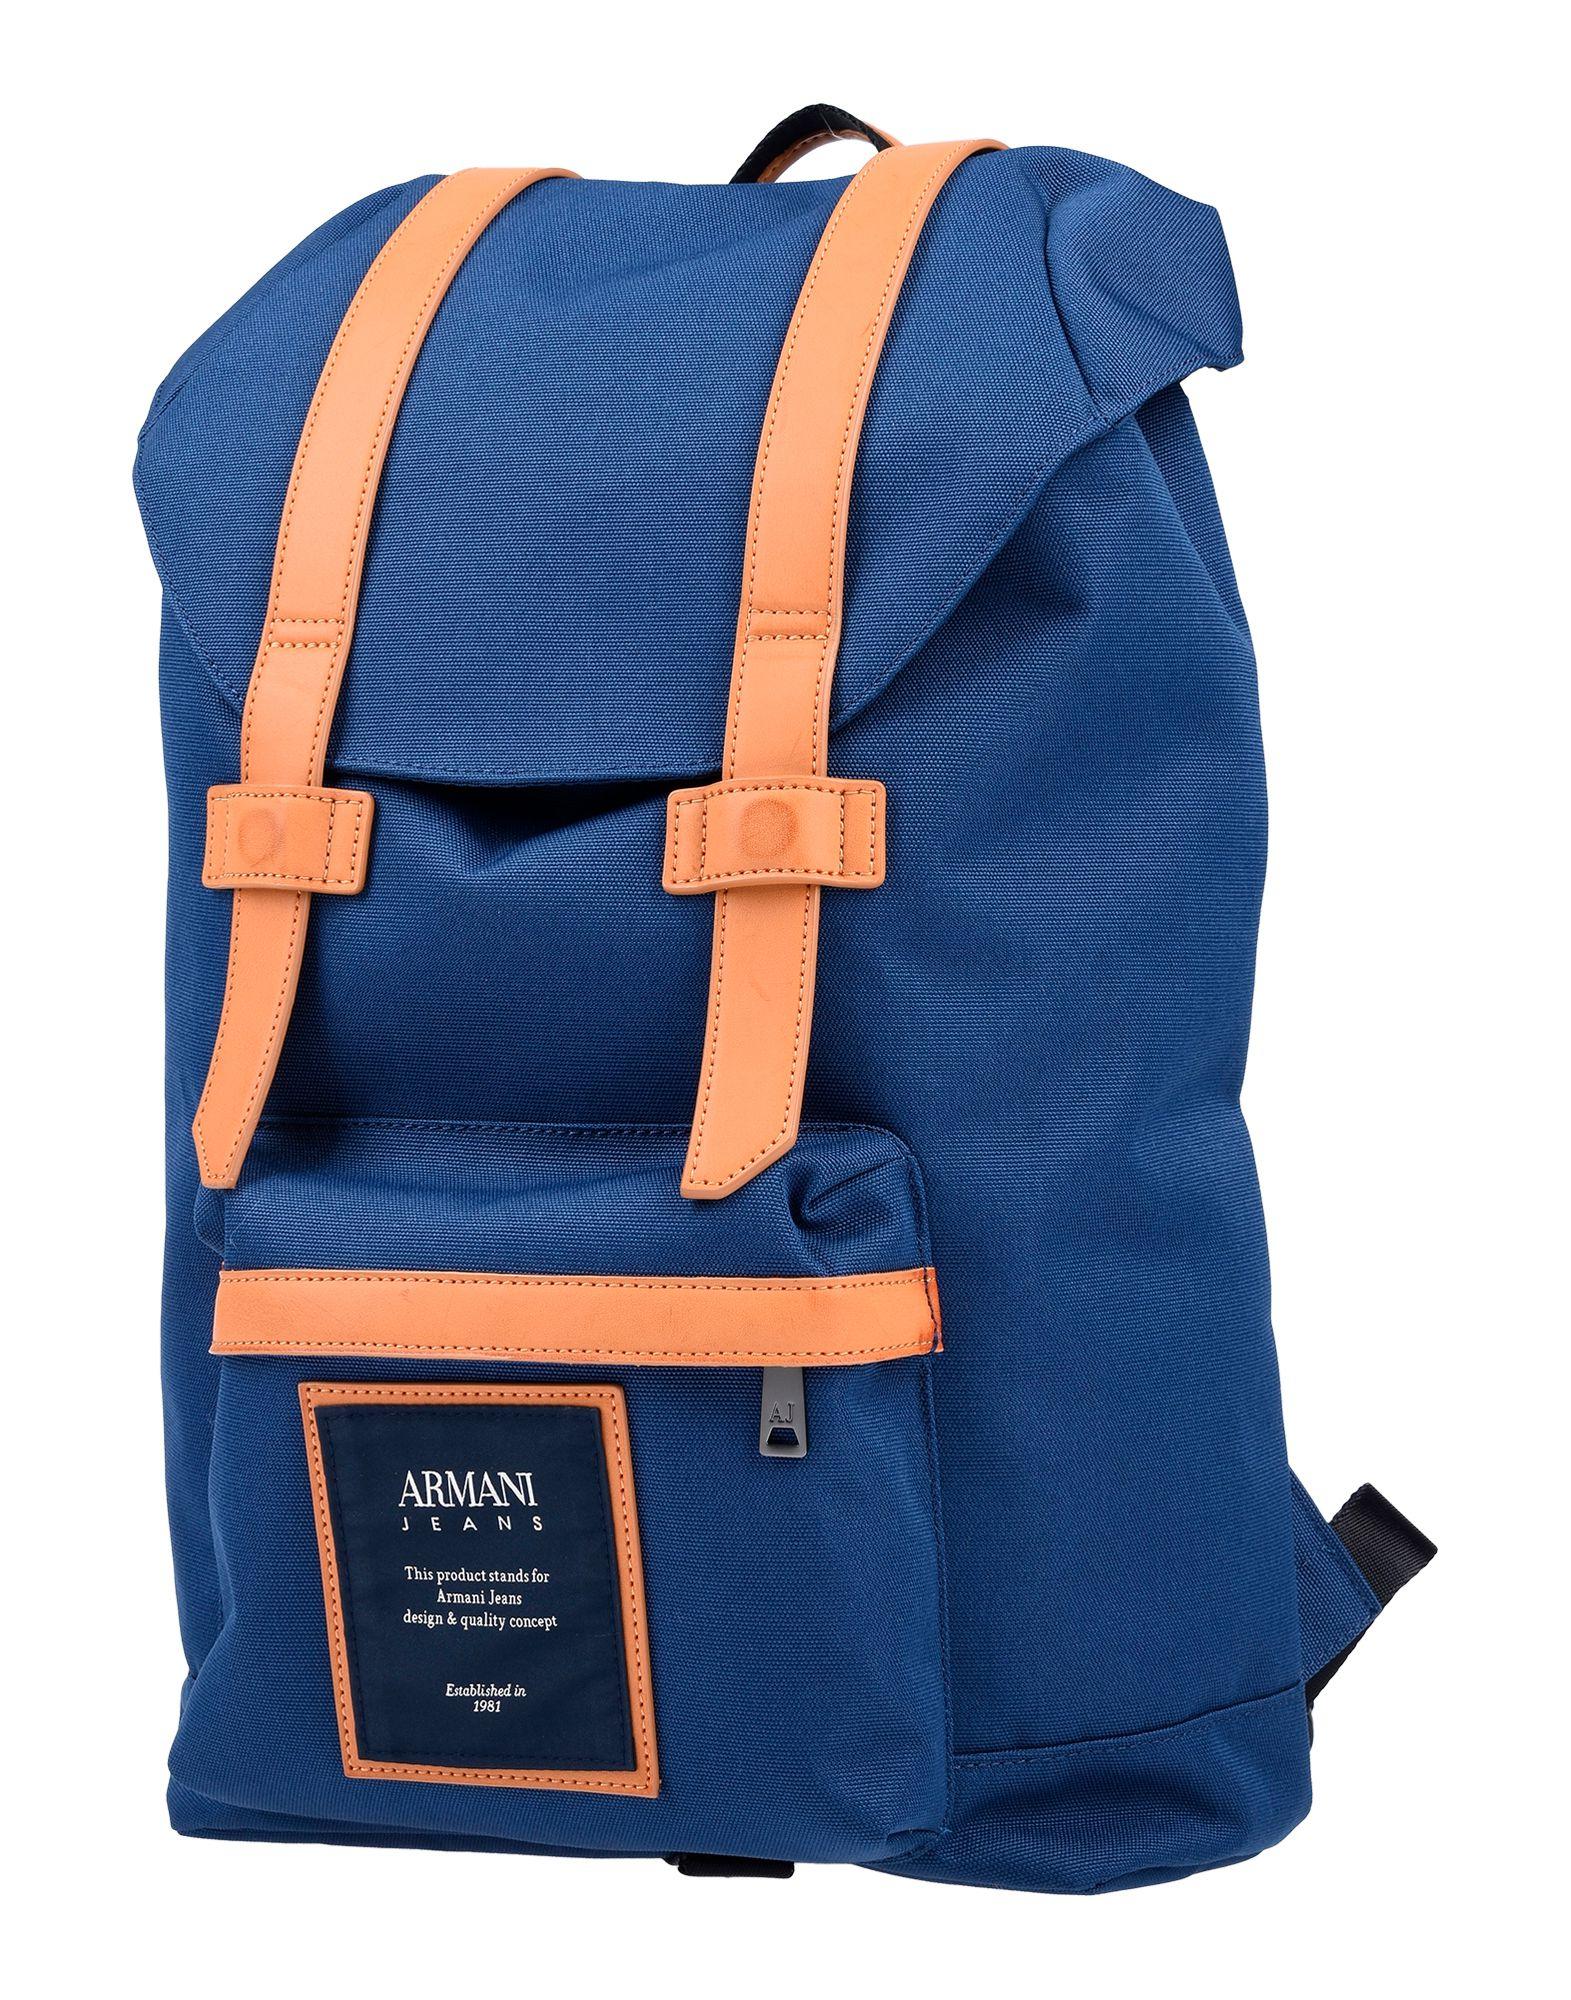 29537347d 《送料無料》ARMANI JEANS メンズ バックパック&ヒップバッグ ブルー ポリエステル 100%